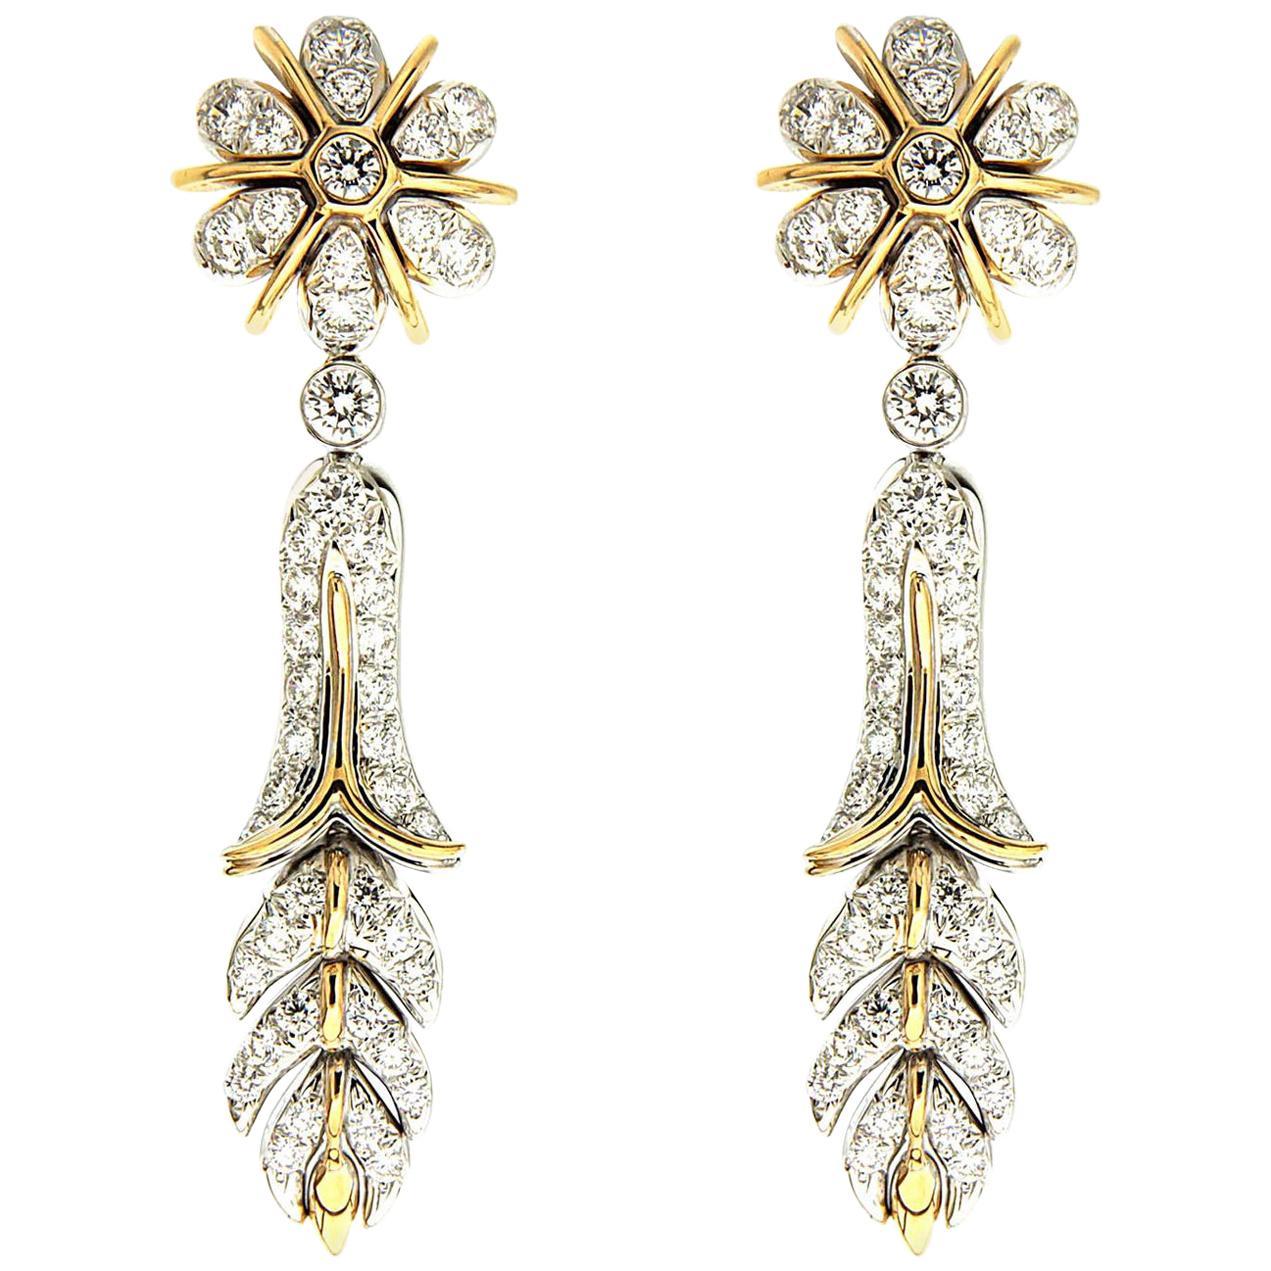 Valentin Magro Orchidea Floral Drop Earrings